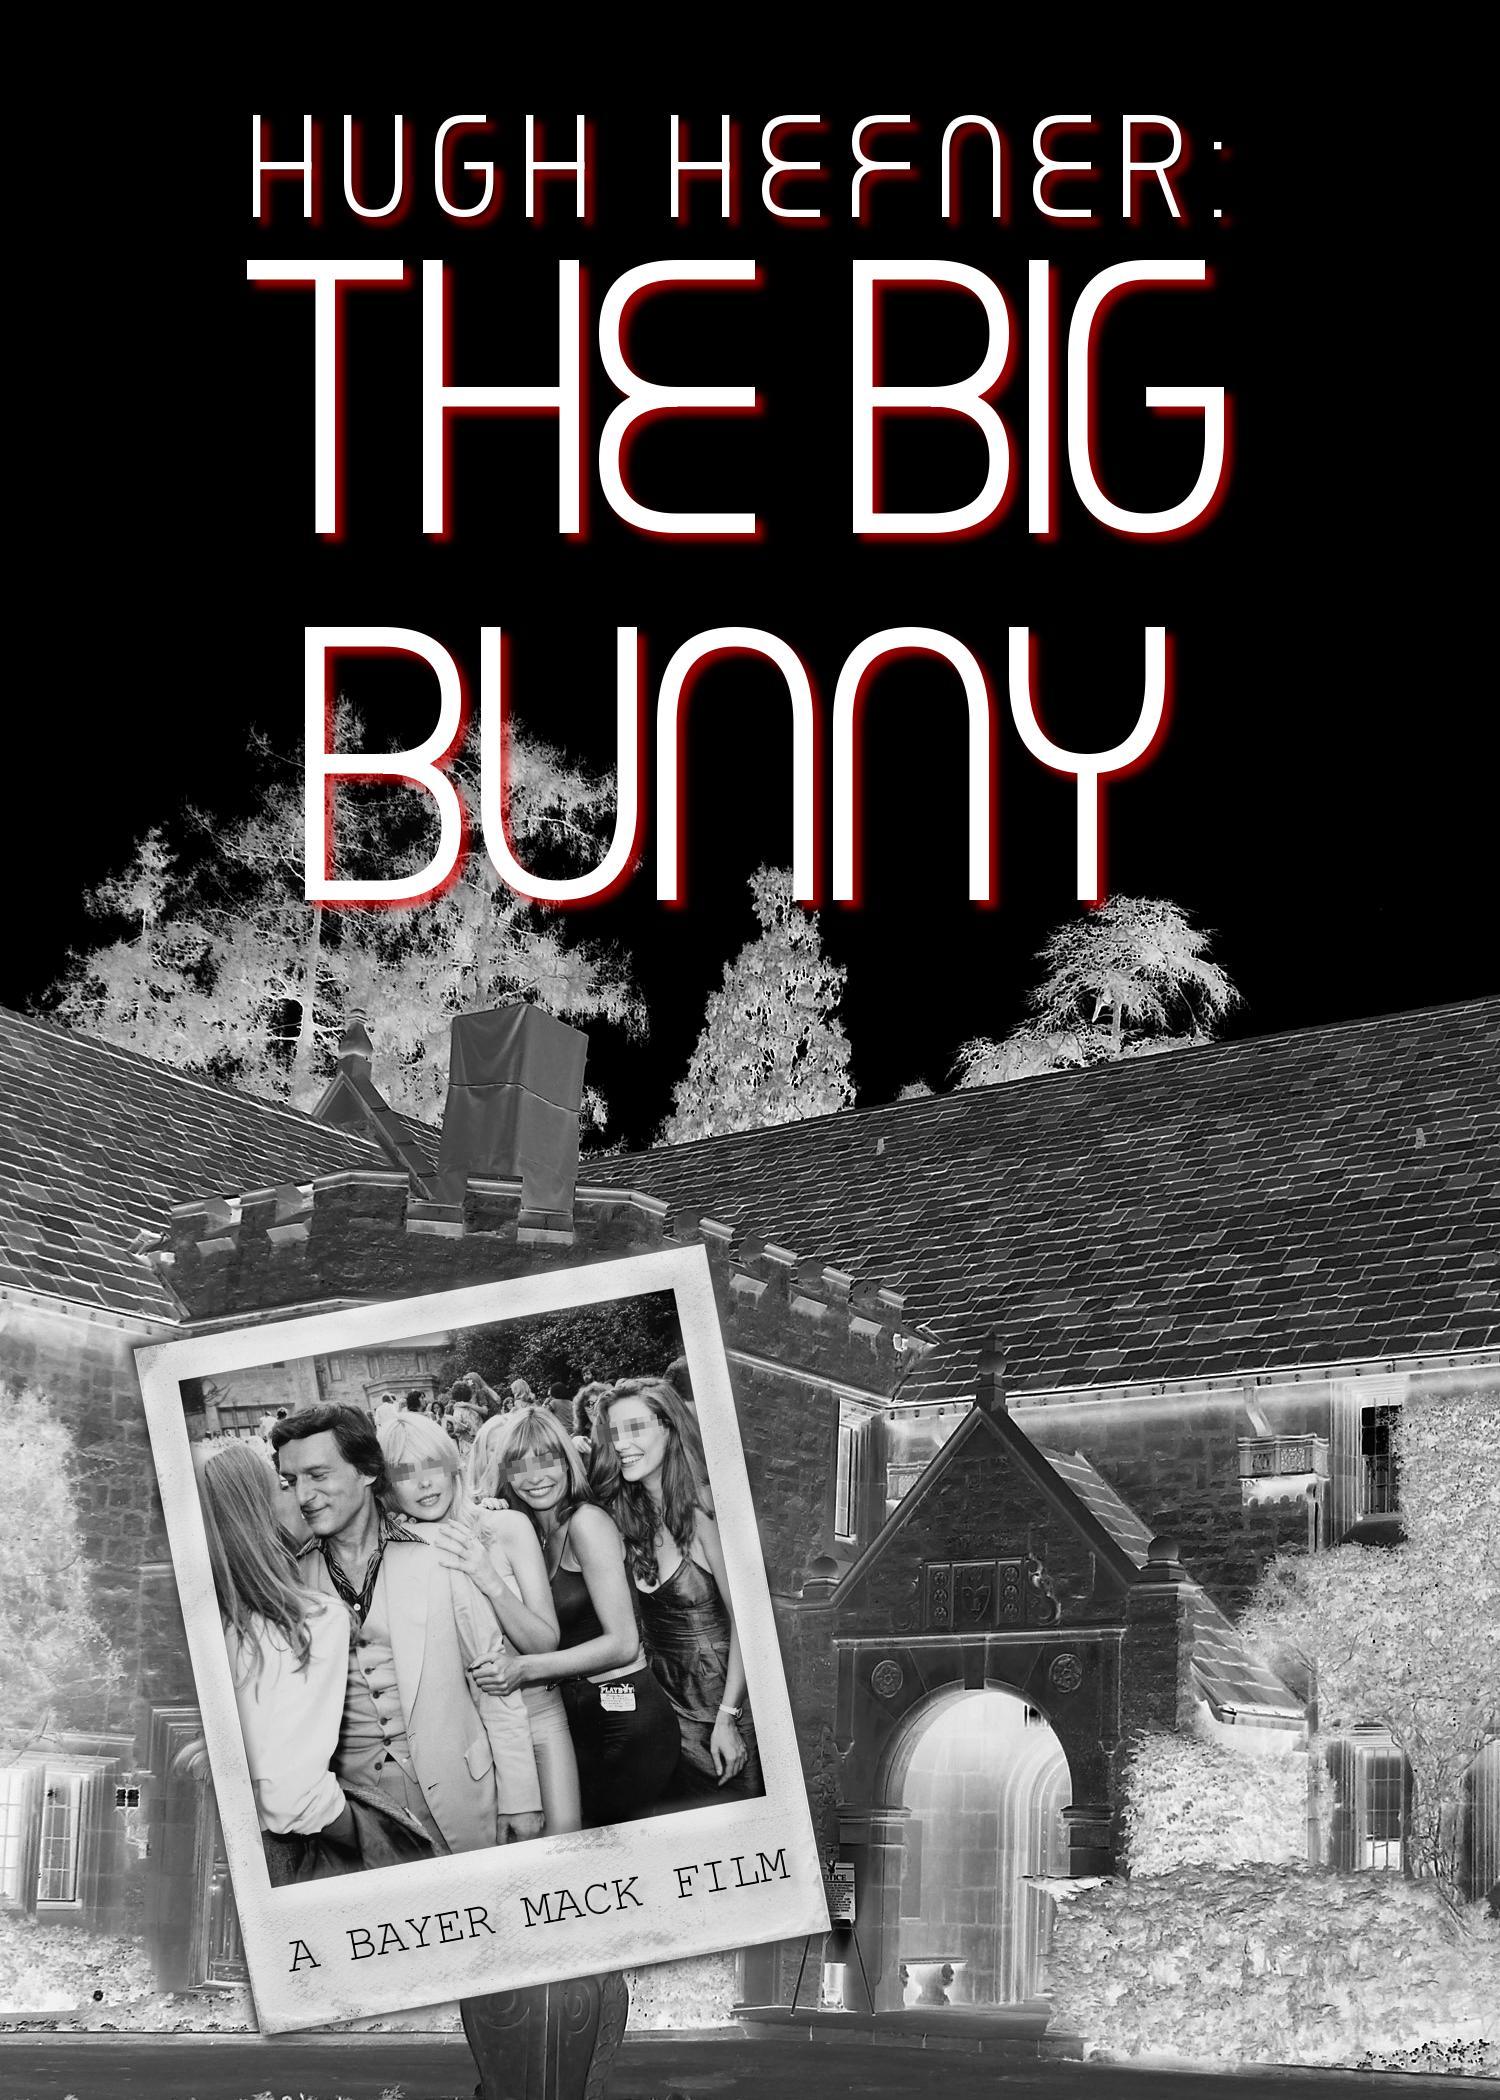 Hugh Hefner The Big Bunny 2018 Imdb